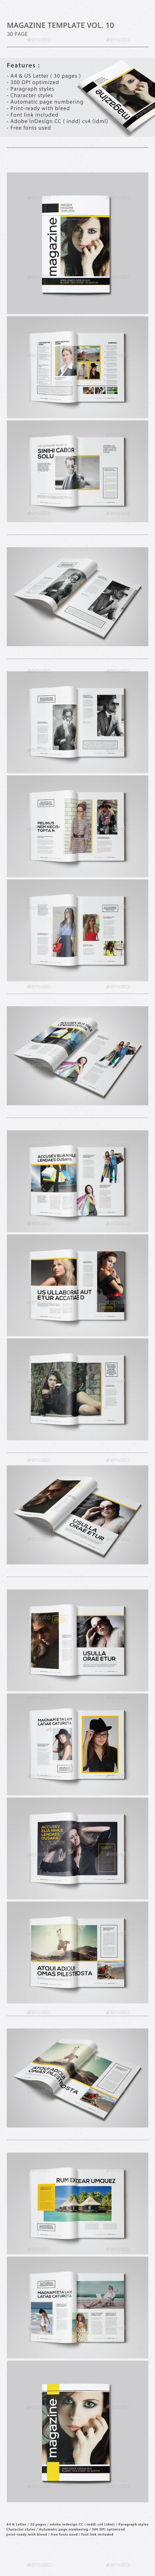 Indesign Magazine Template Vol.10